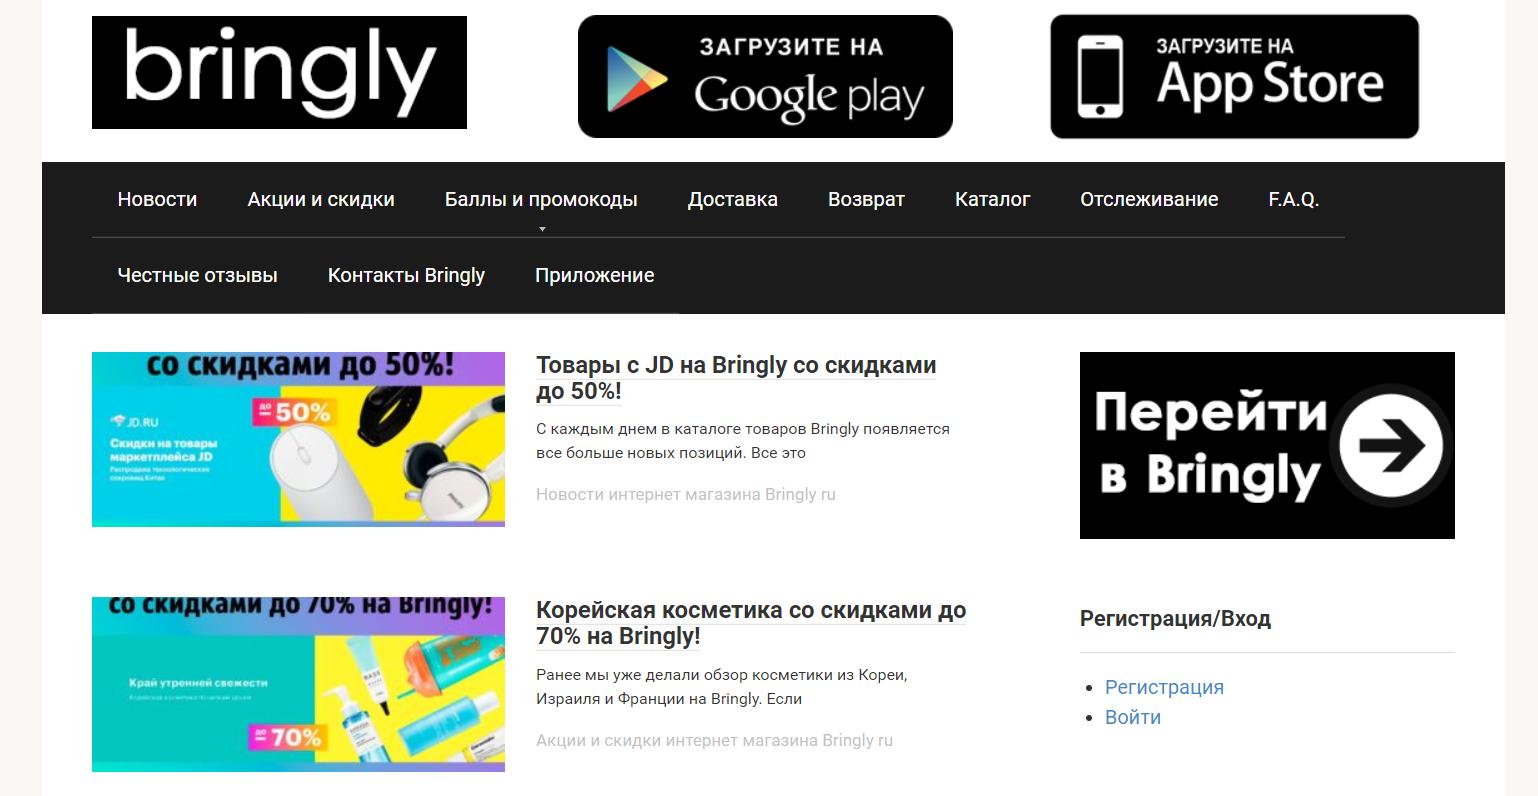 Сбербанк и «Яндекс» остановили развитие своего маркетплейса